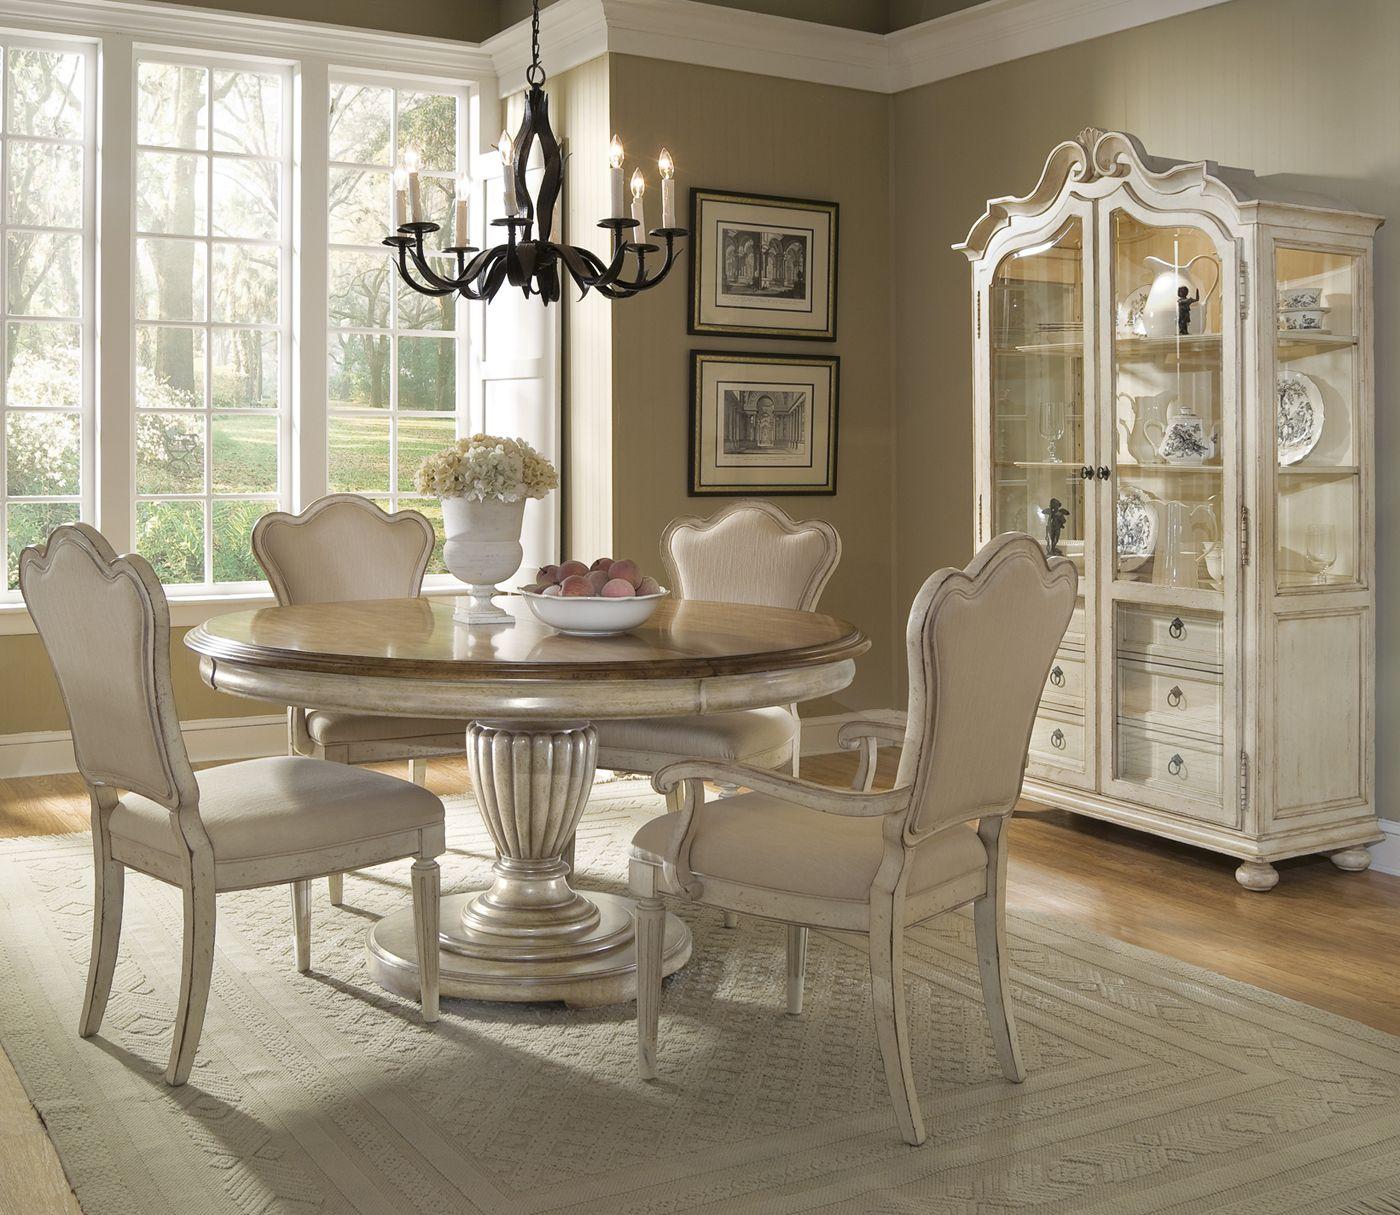 Art home furniture provenance round dining set decor